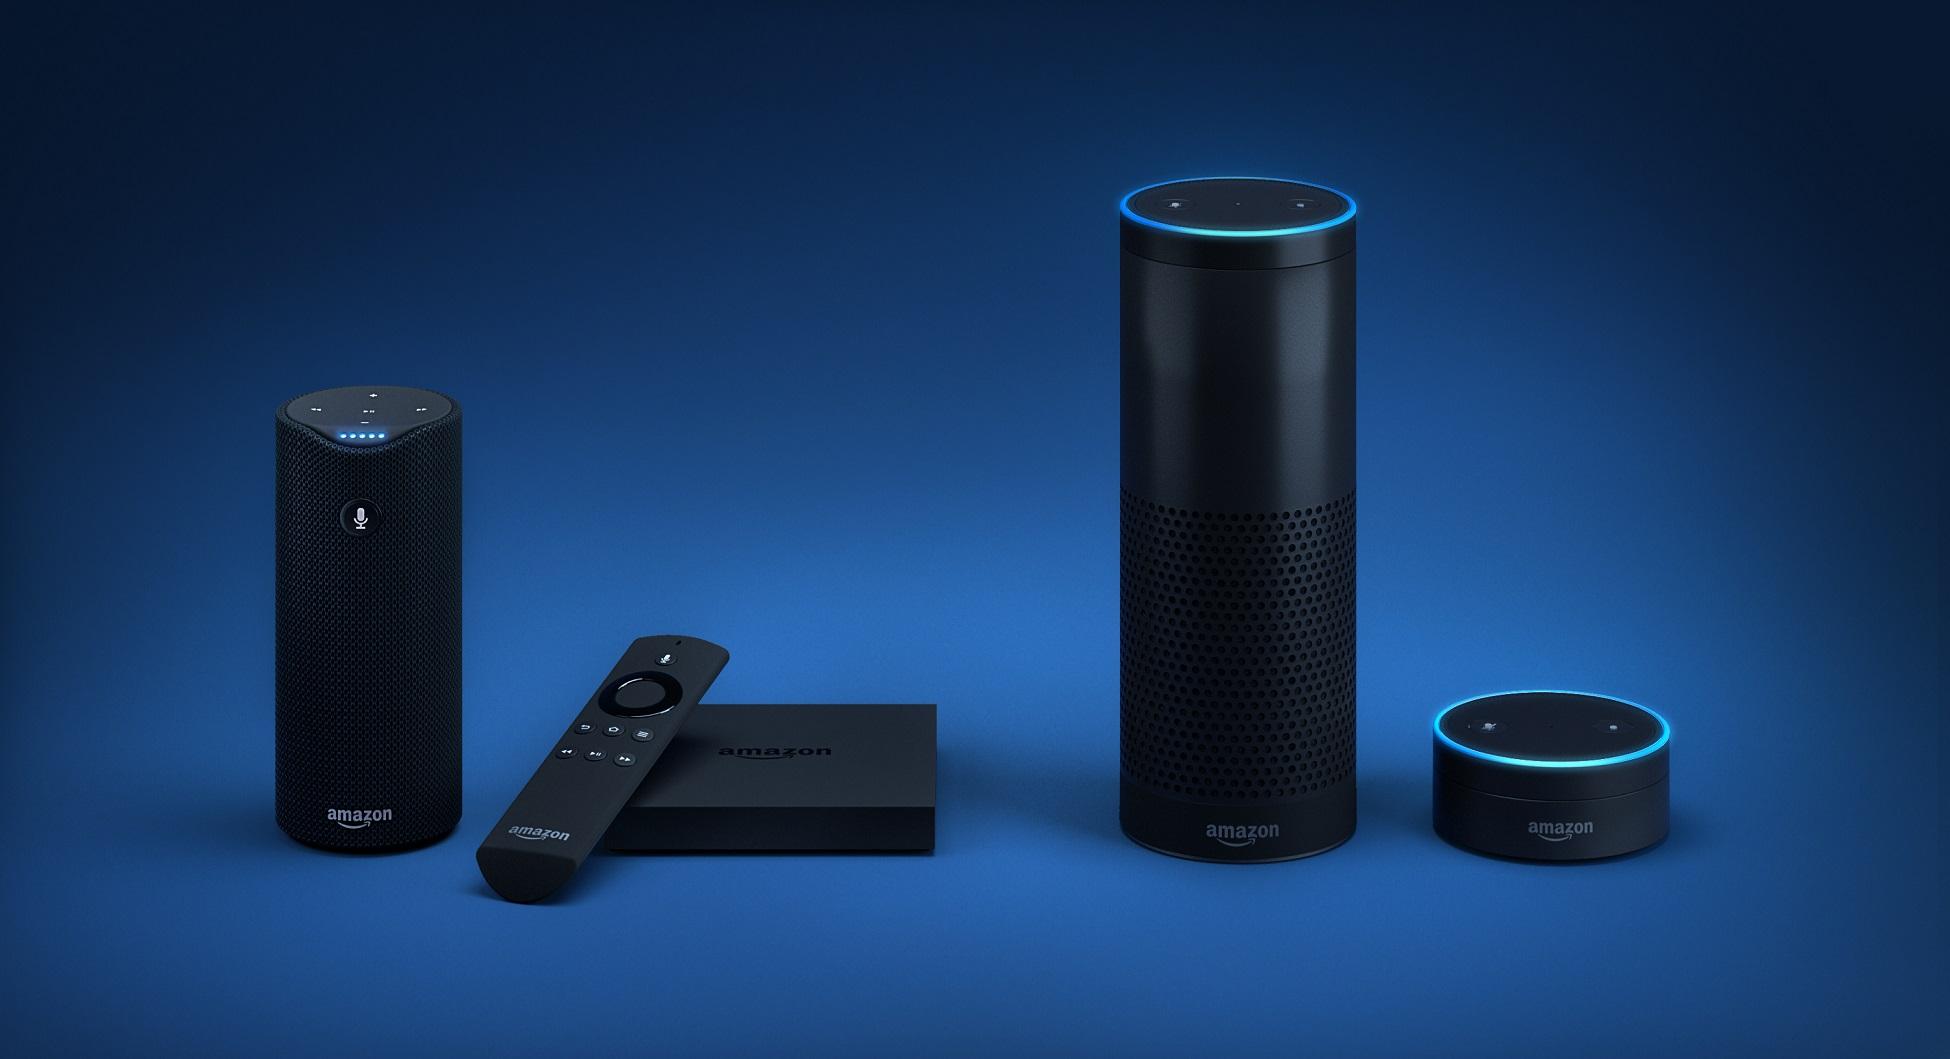 Amazon Echo family